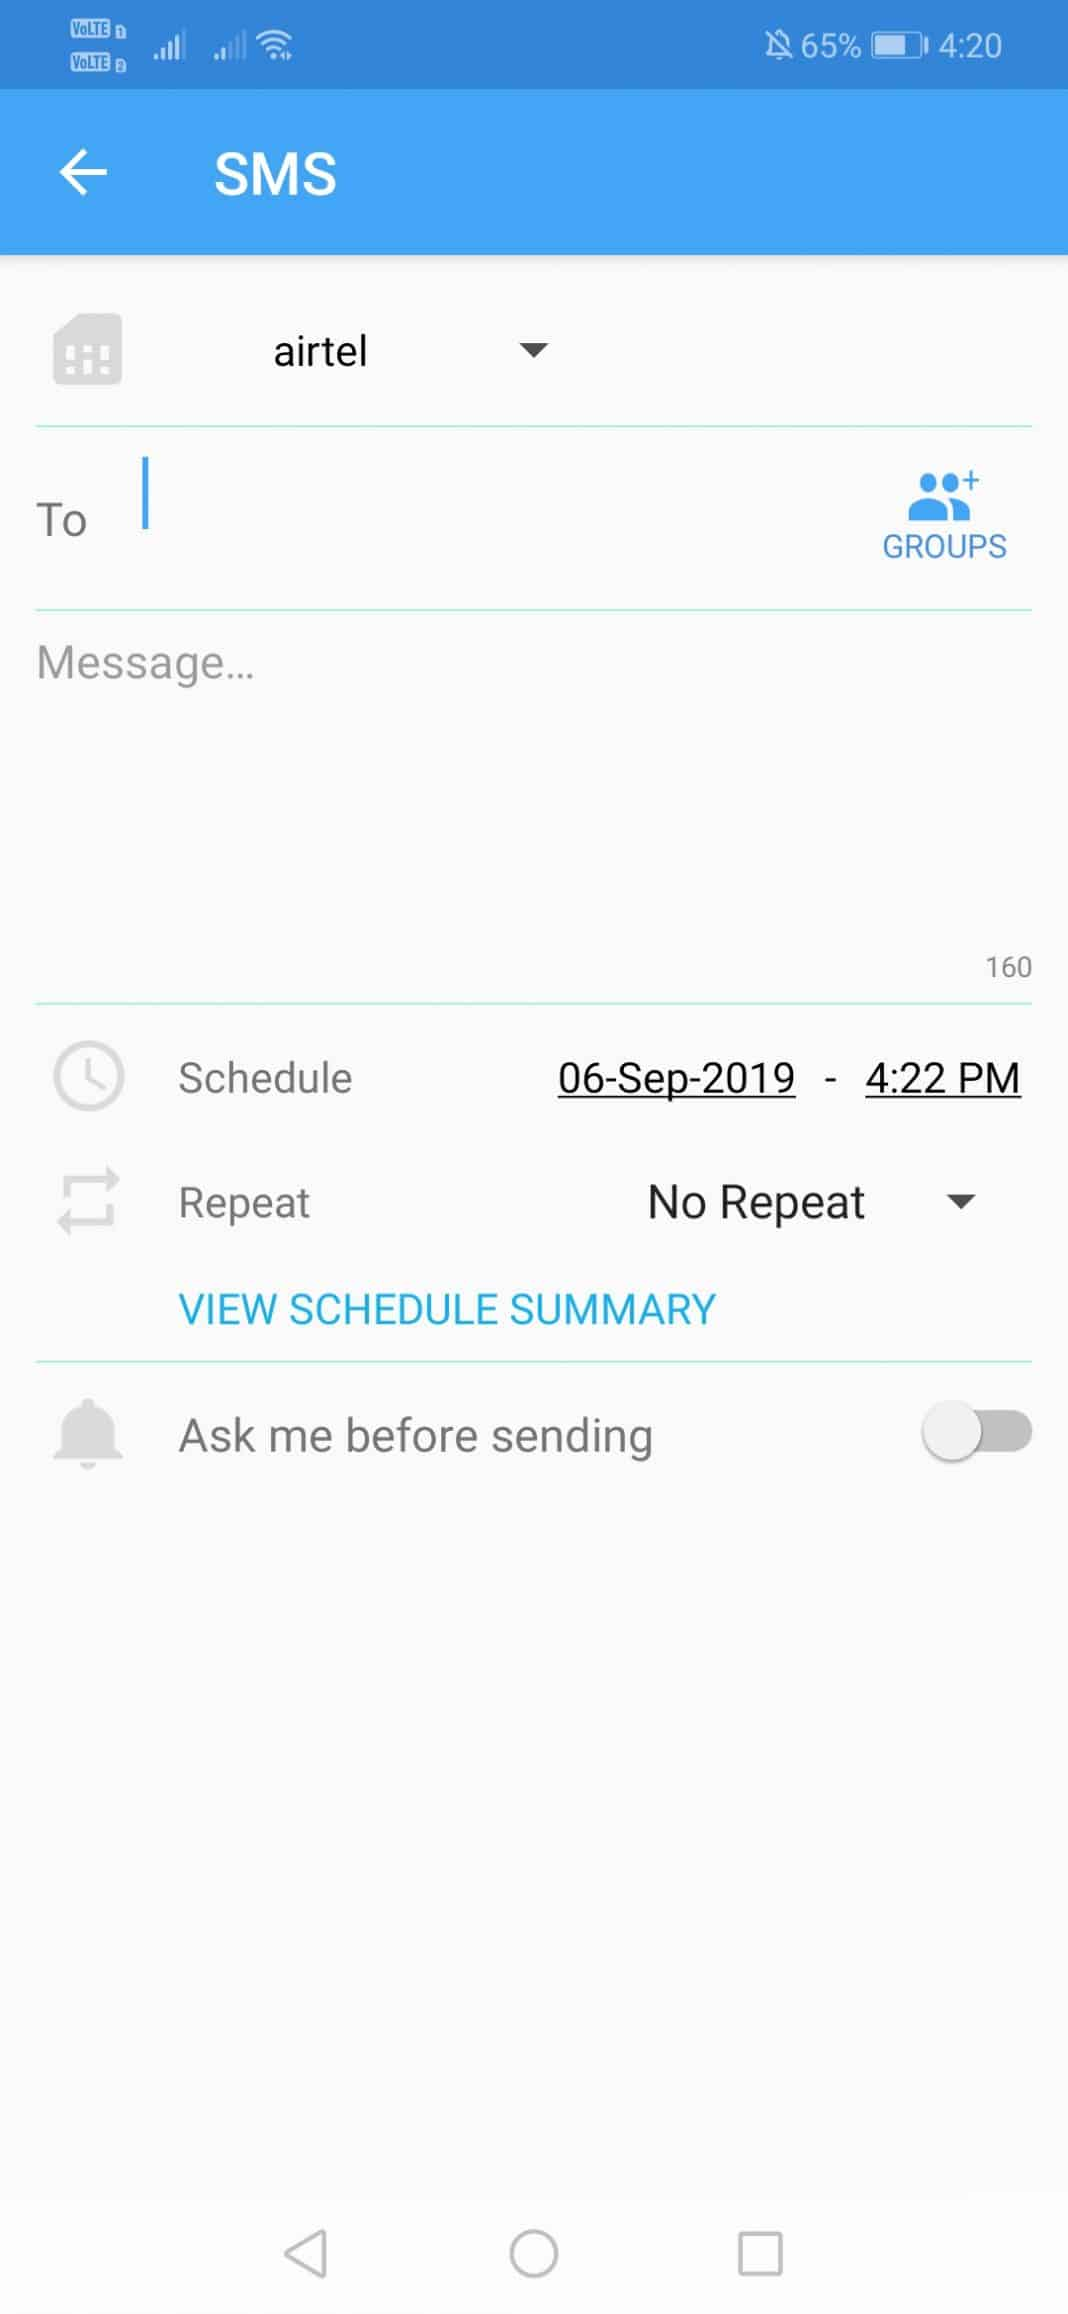 Using SKEDit Scheduling App